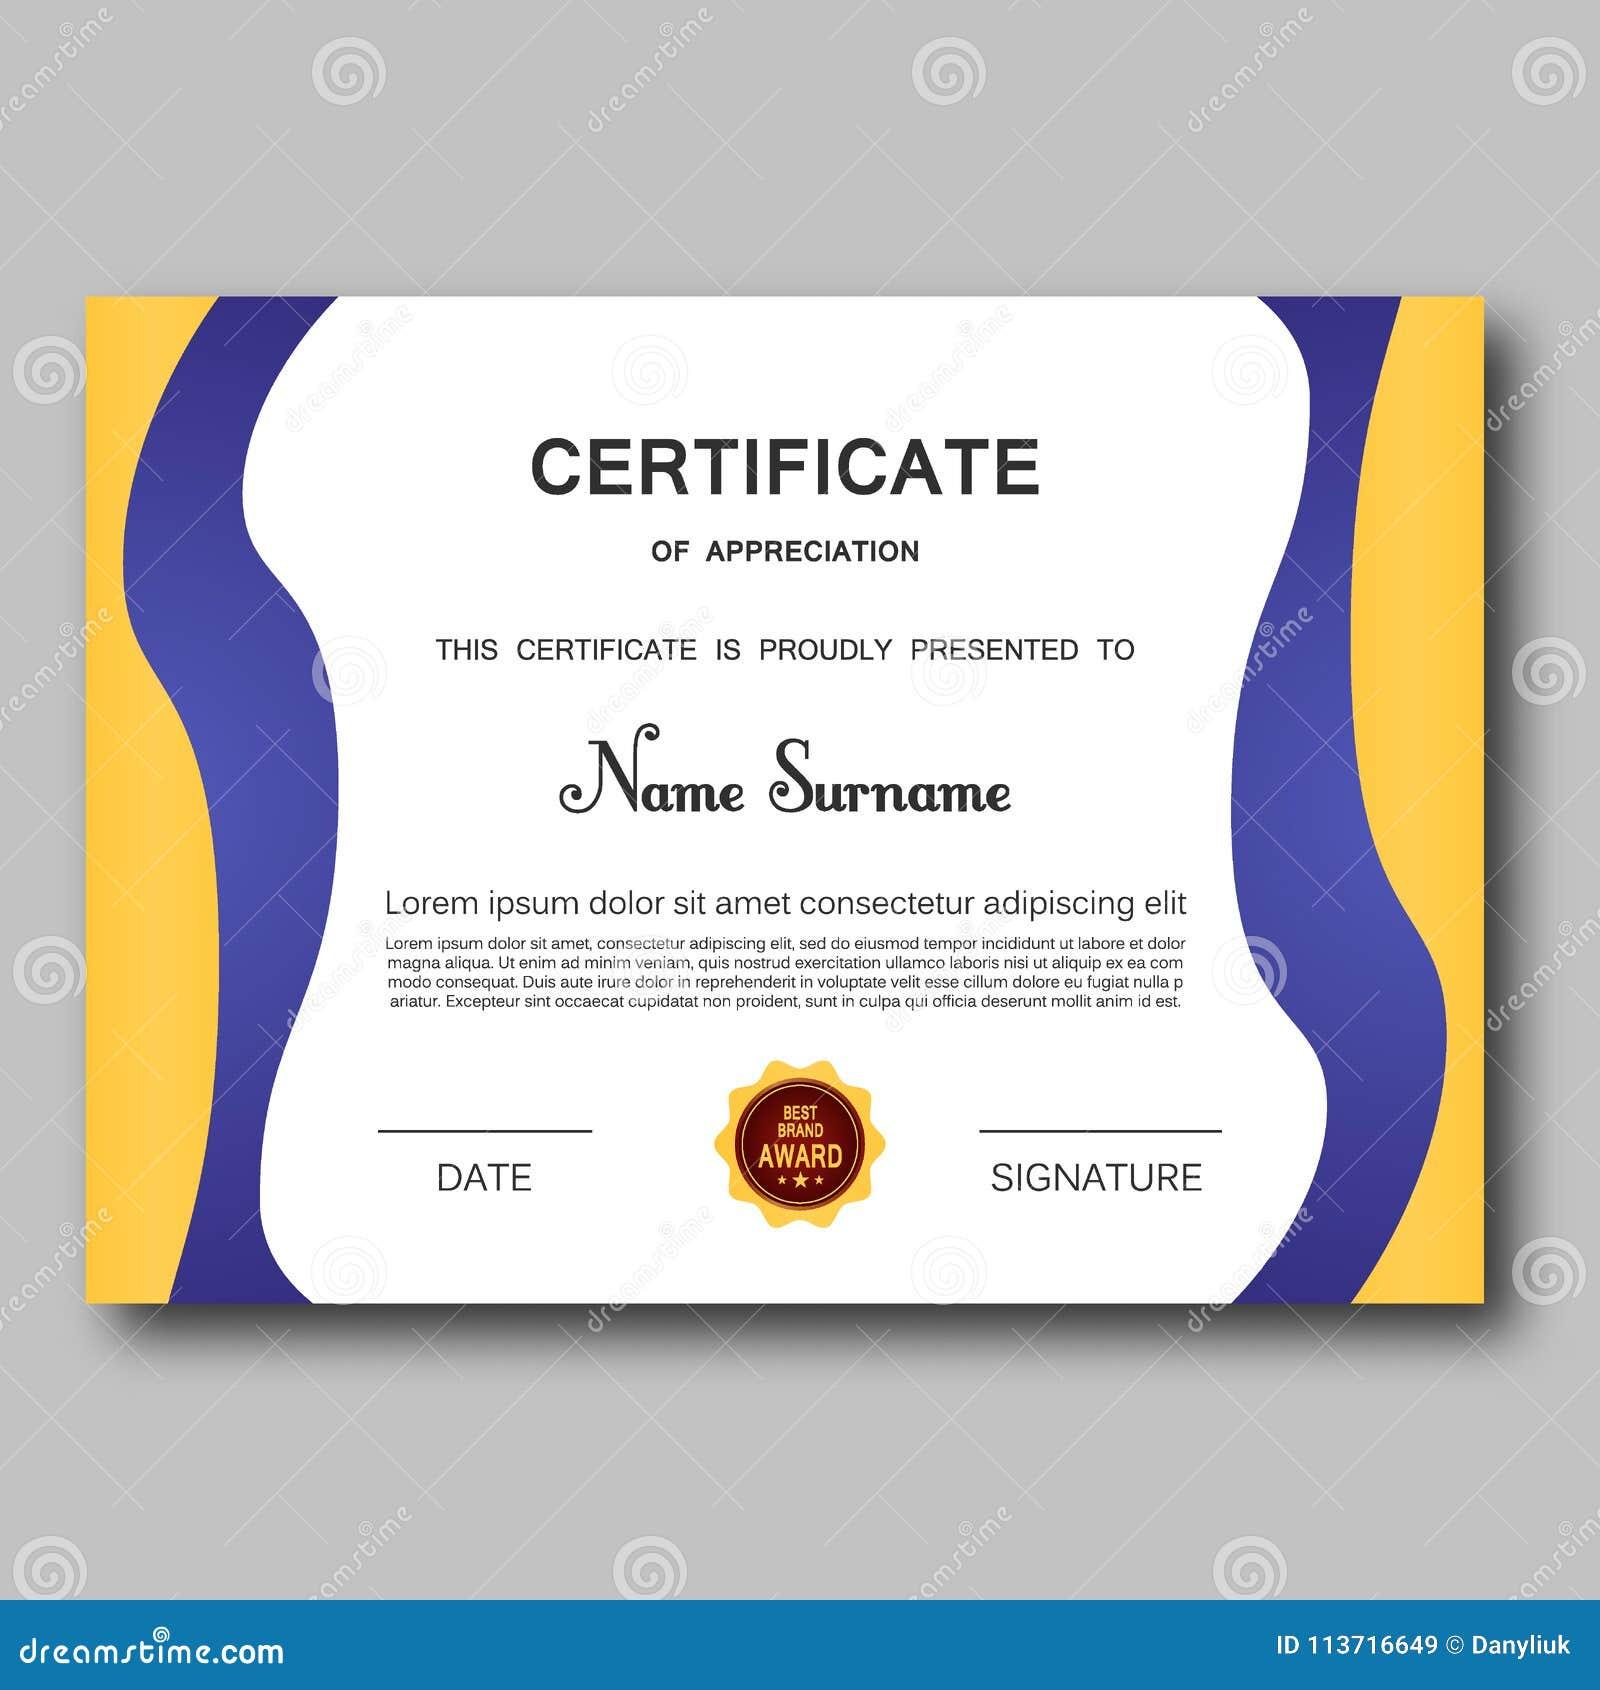 certificate of appreciation template vector trendy geometric design